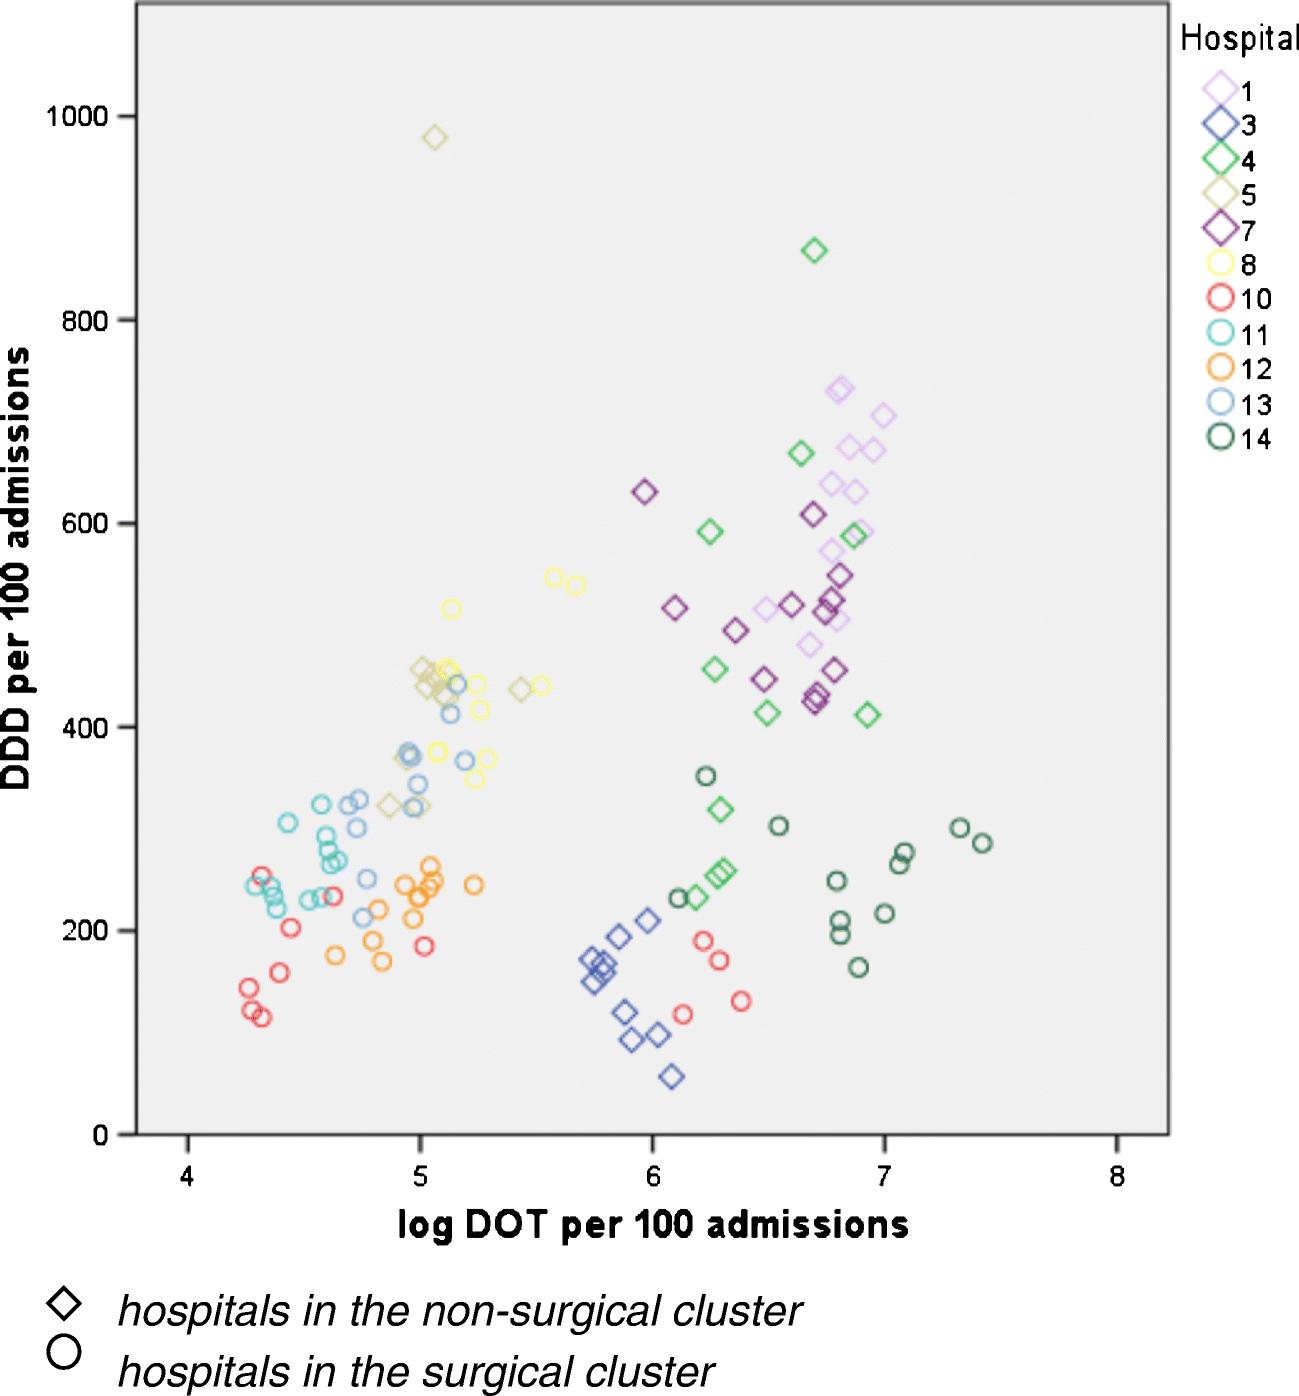 How to measure quantitative antibiotic use in order to